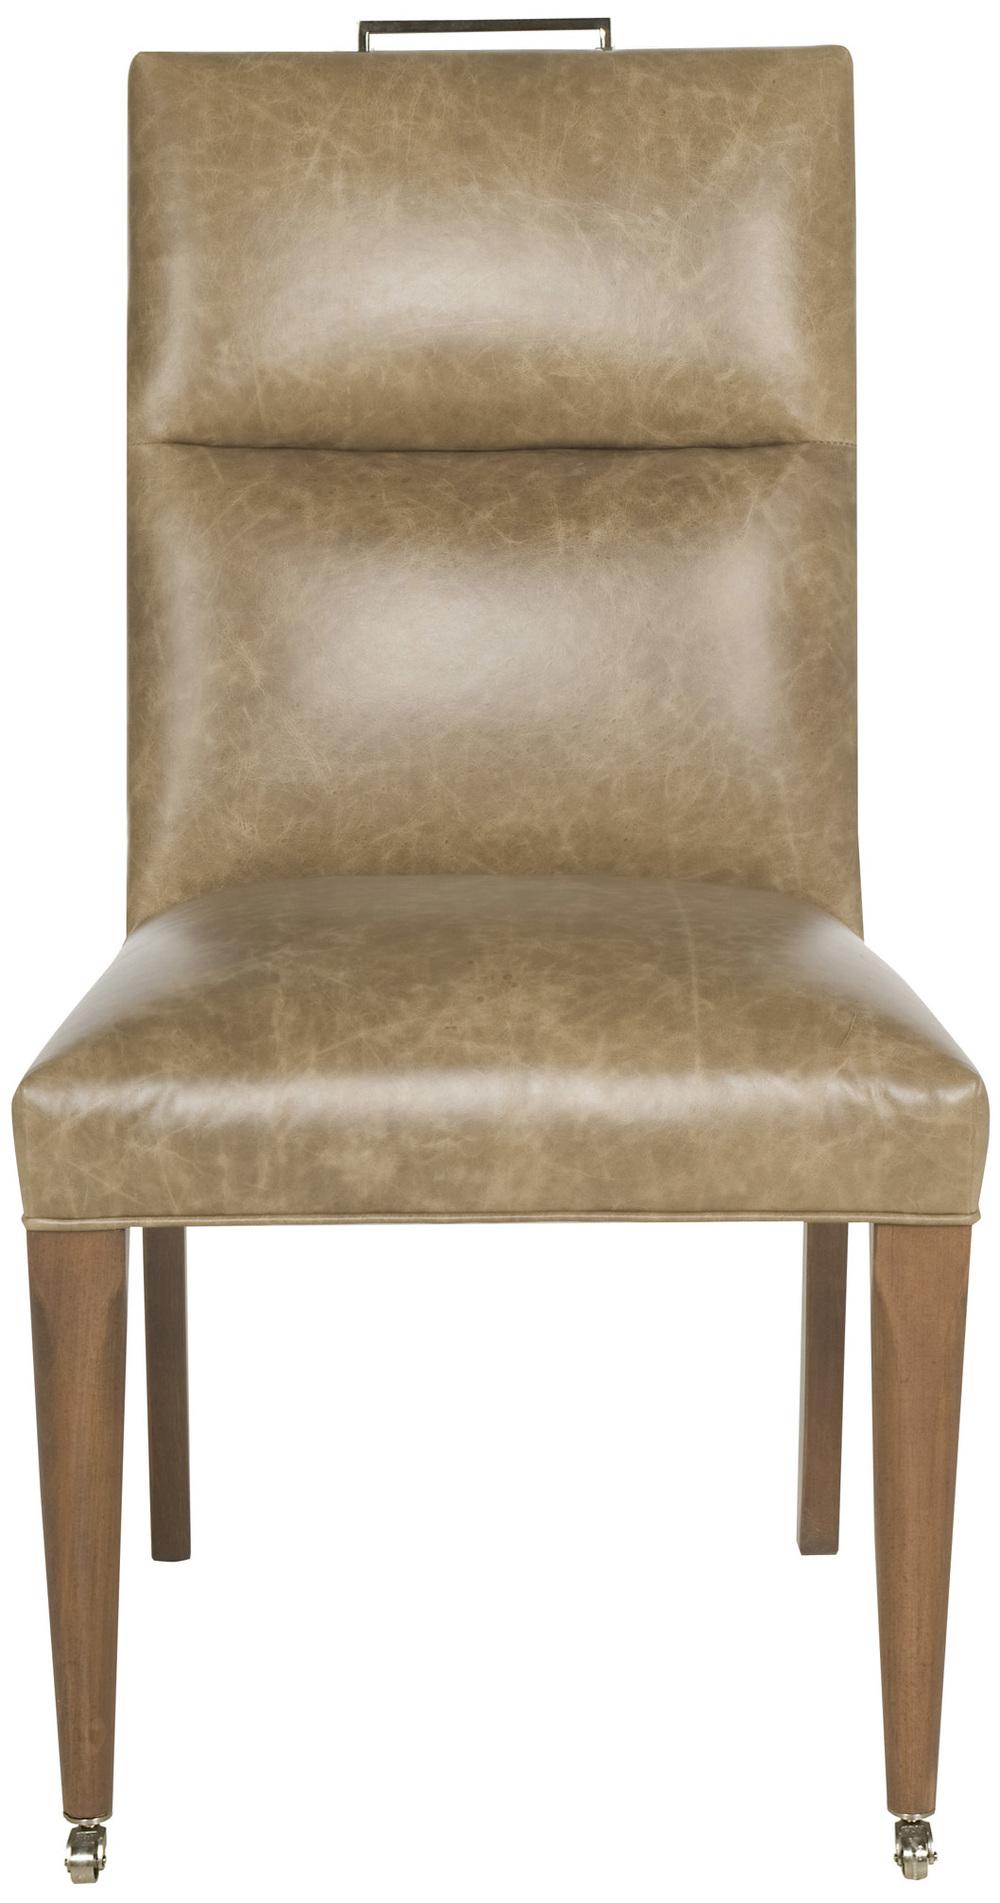 Vanguard Furniture - Brattle Road Side Chair